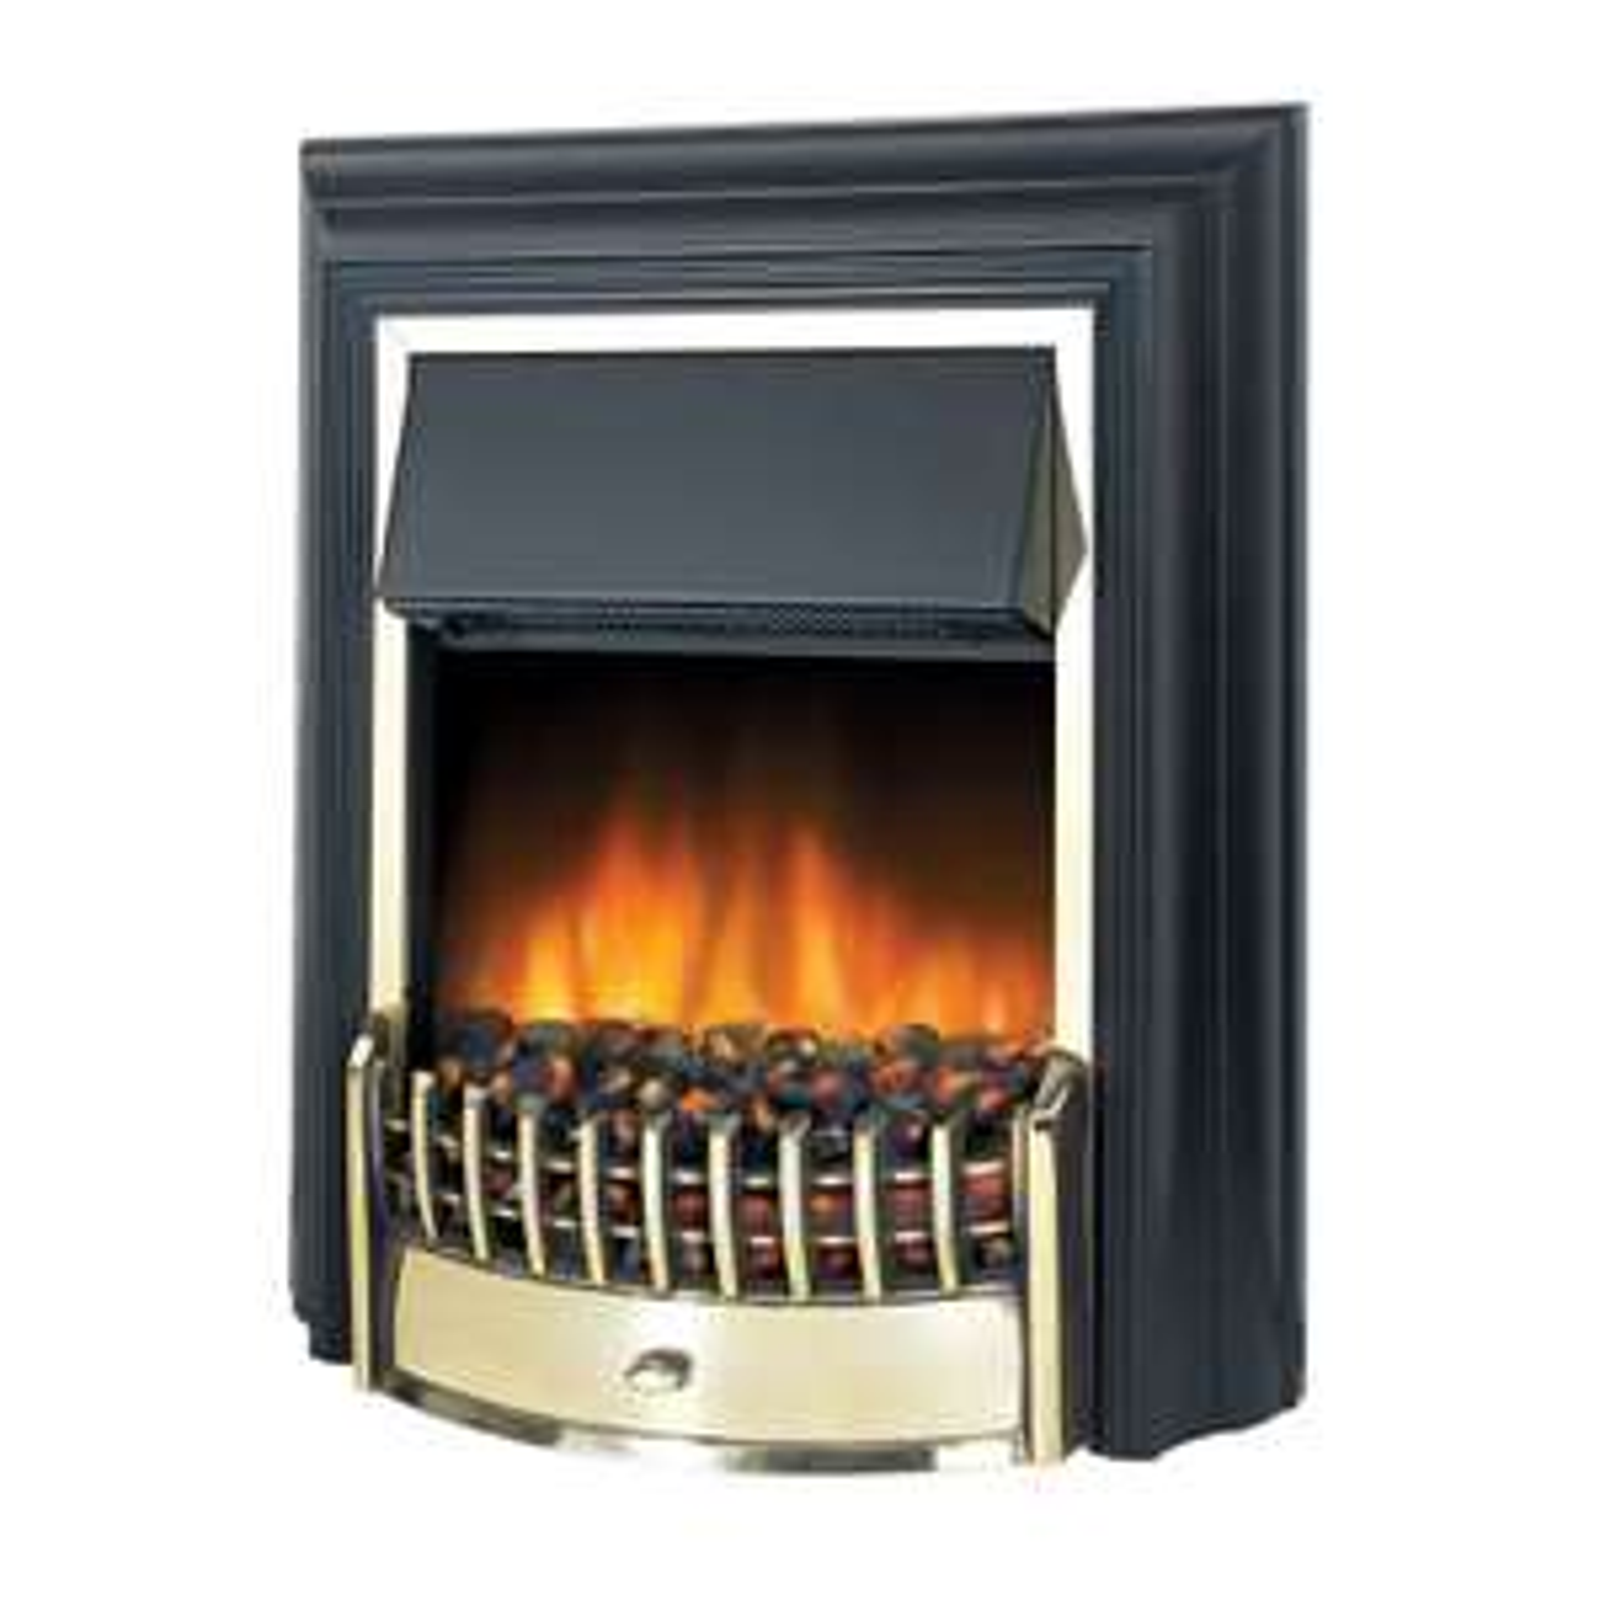 Dimplex Cheriton Electric Freestanding Fire - 2kW - £125 @ Homebase (free C&C)